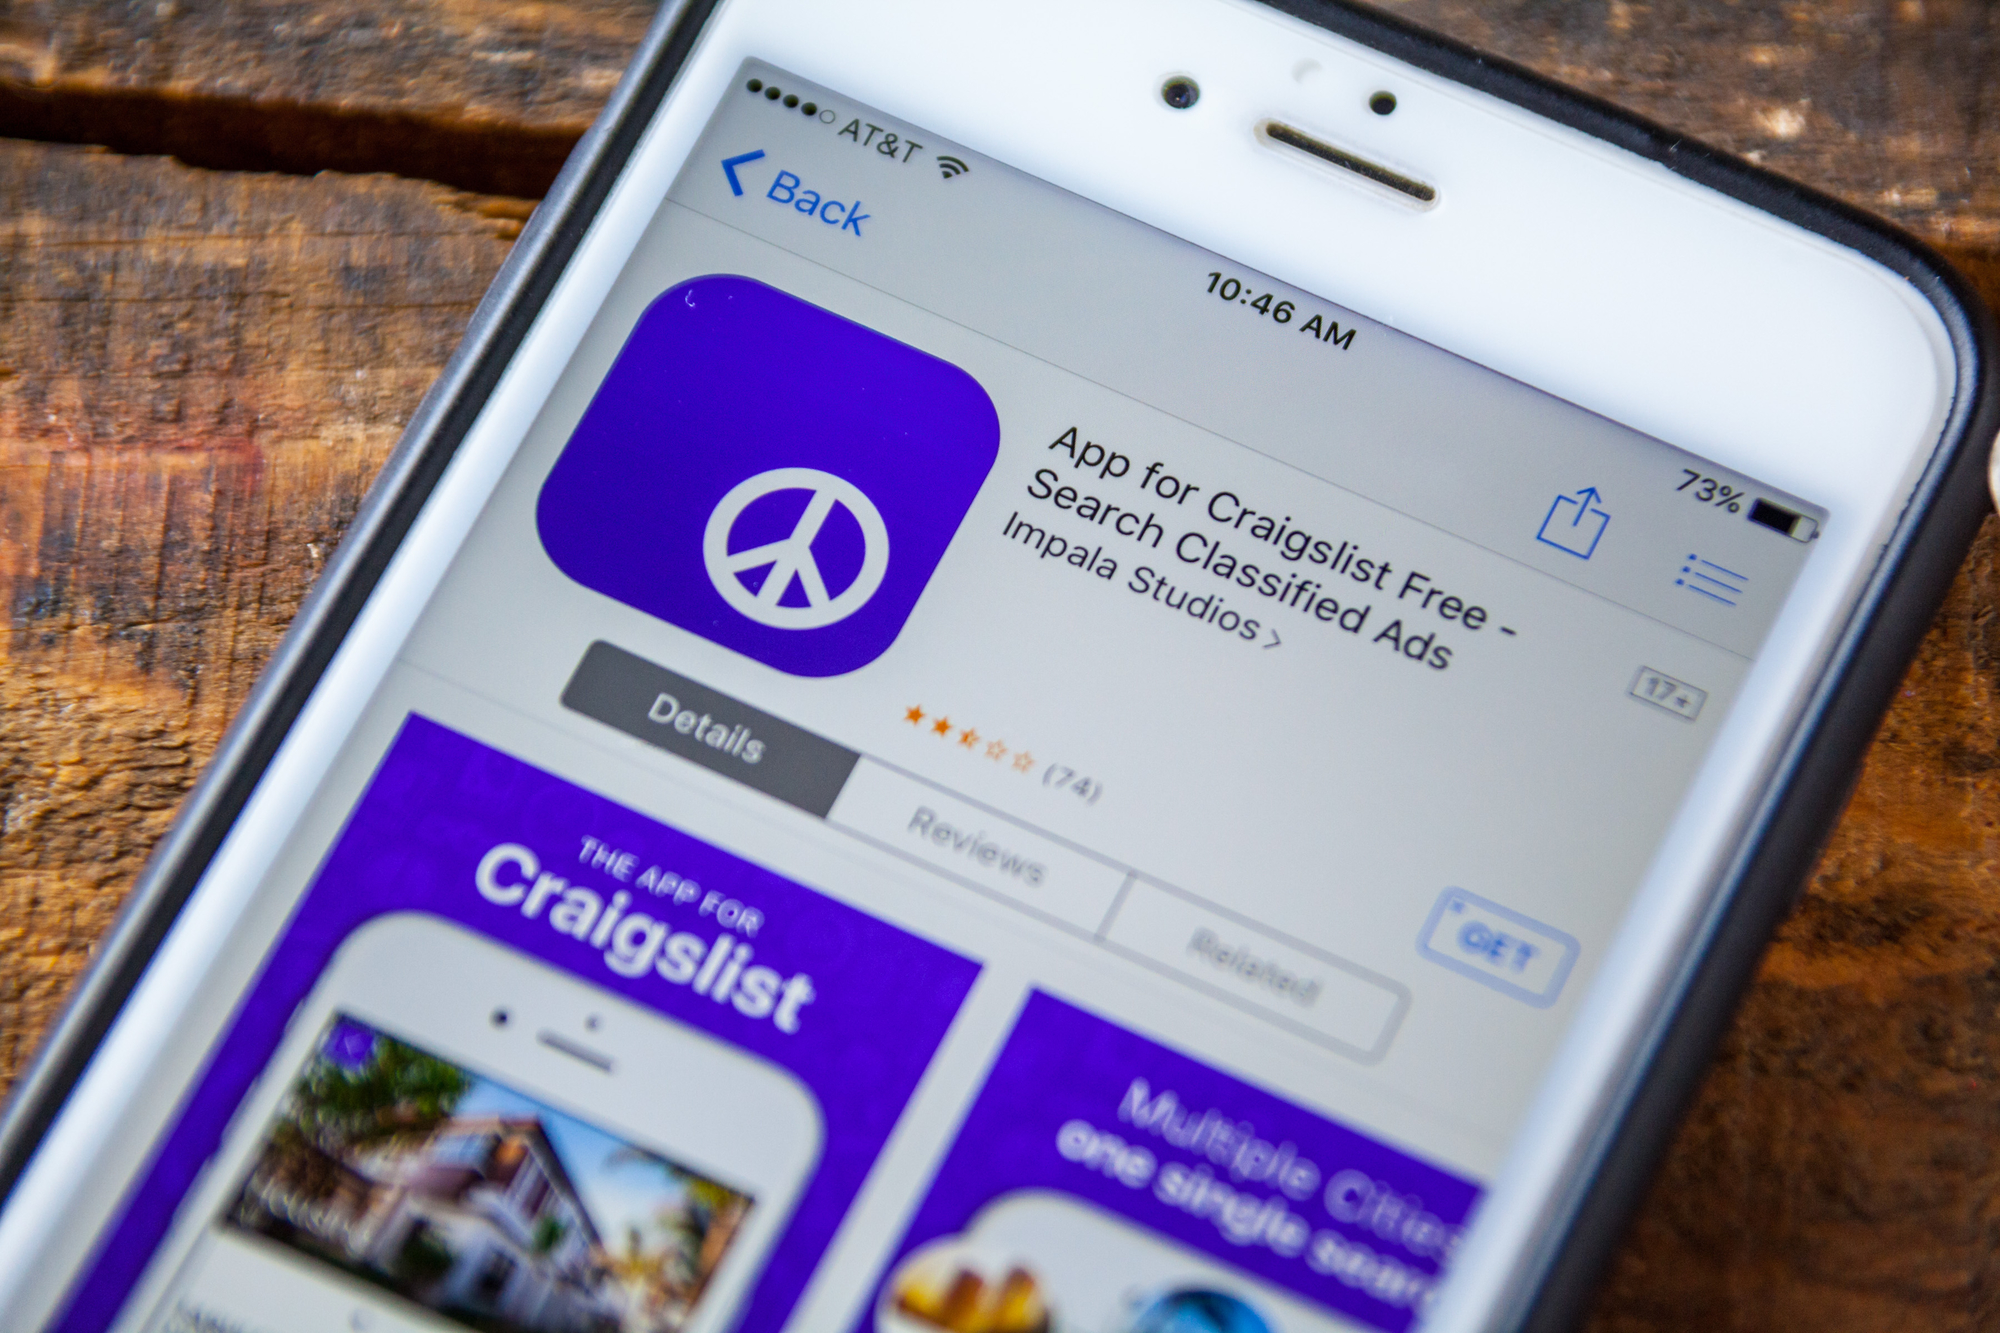 Las Vegas Nv September 22 2016 Craigslist Iphone App In Th